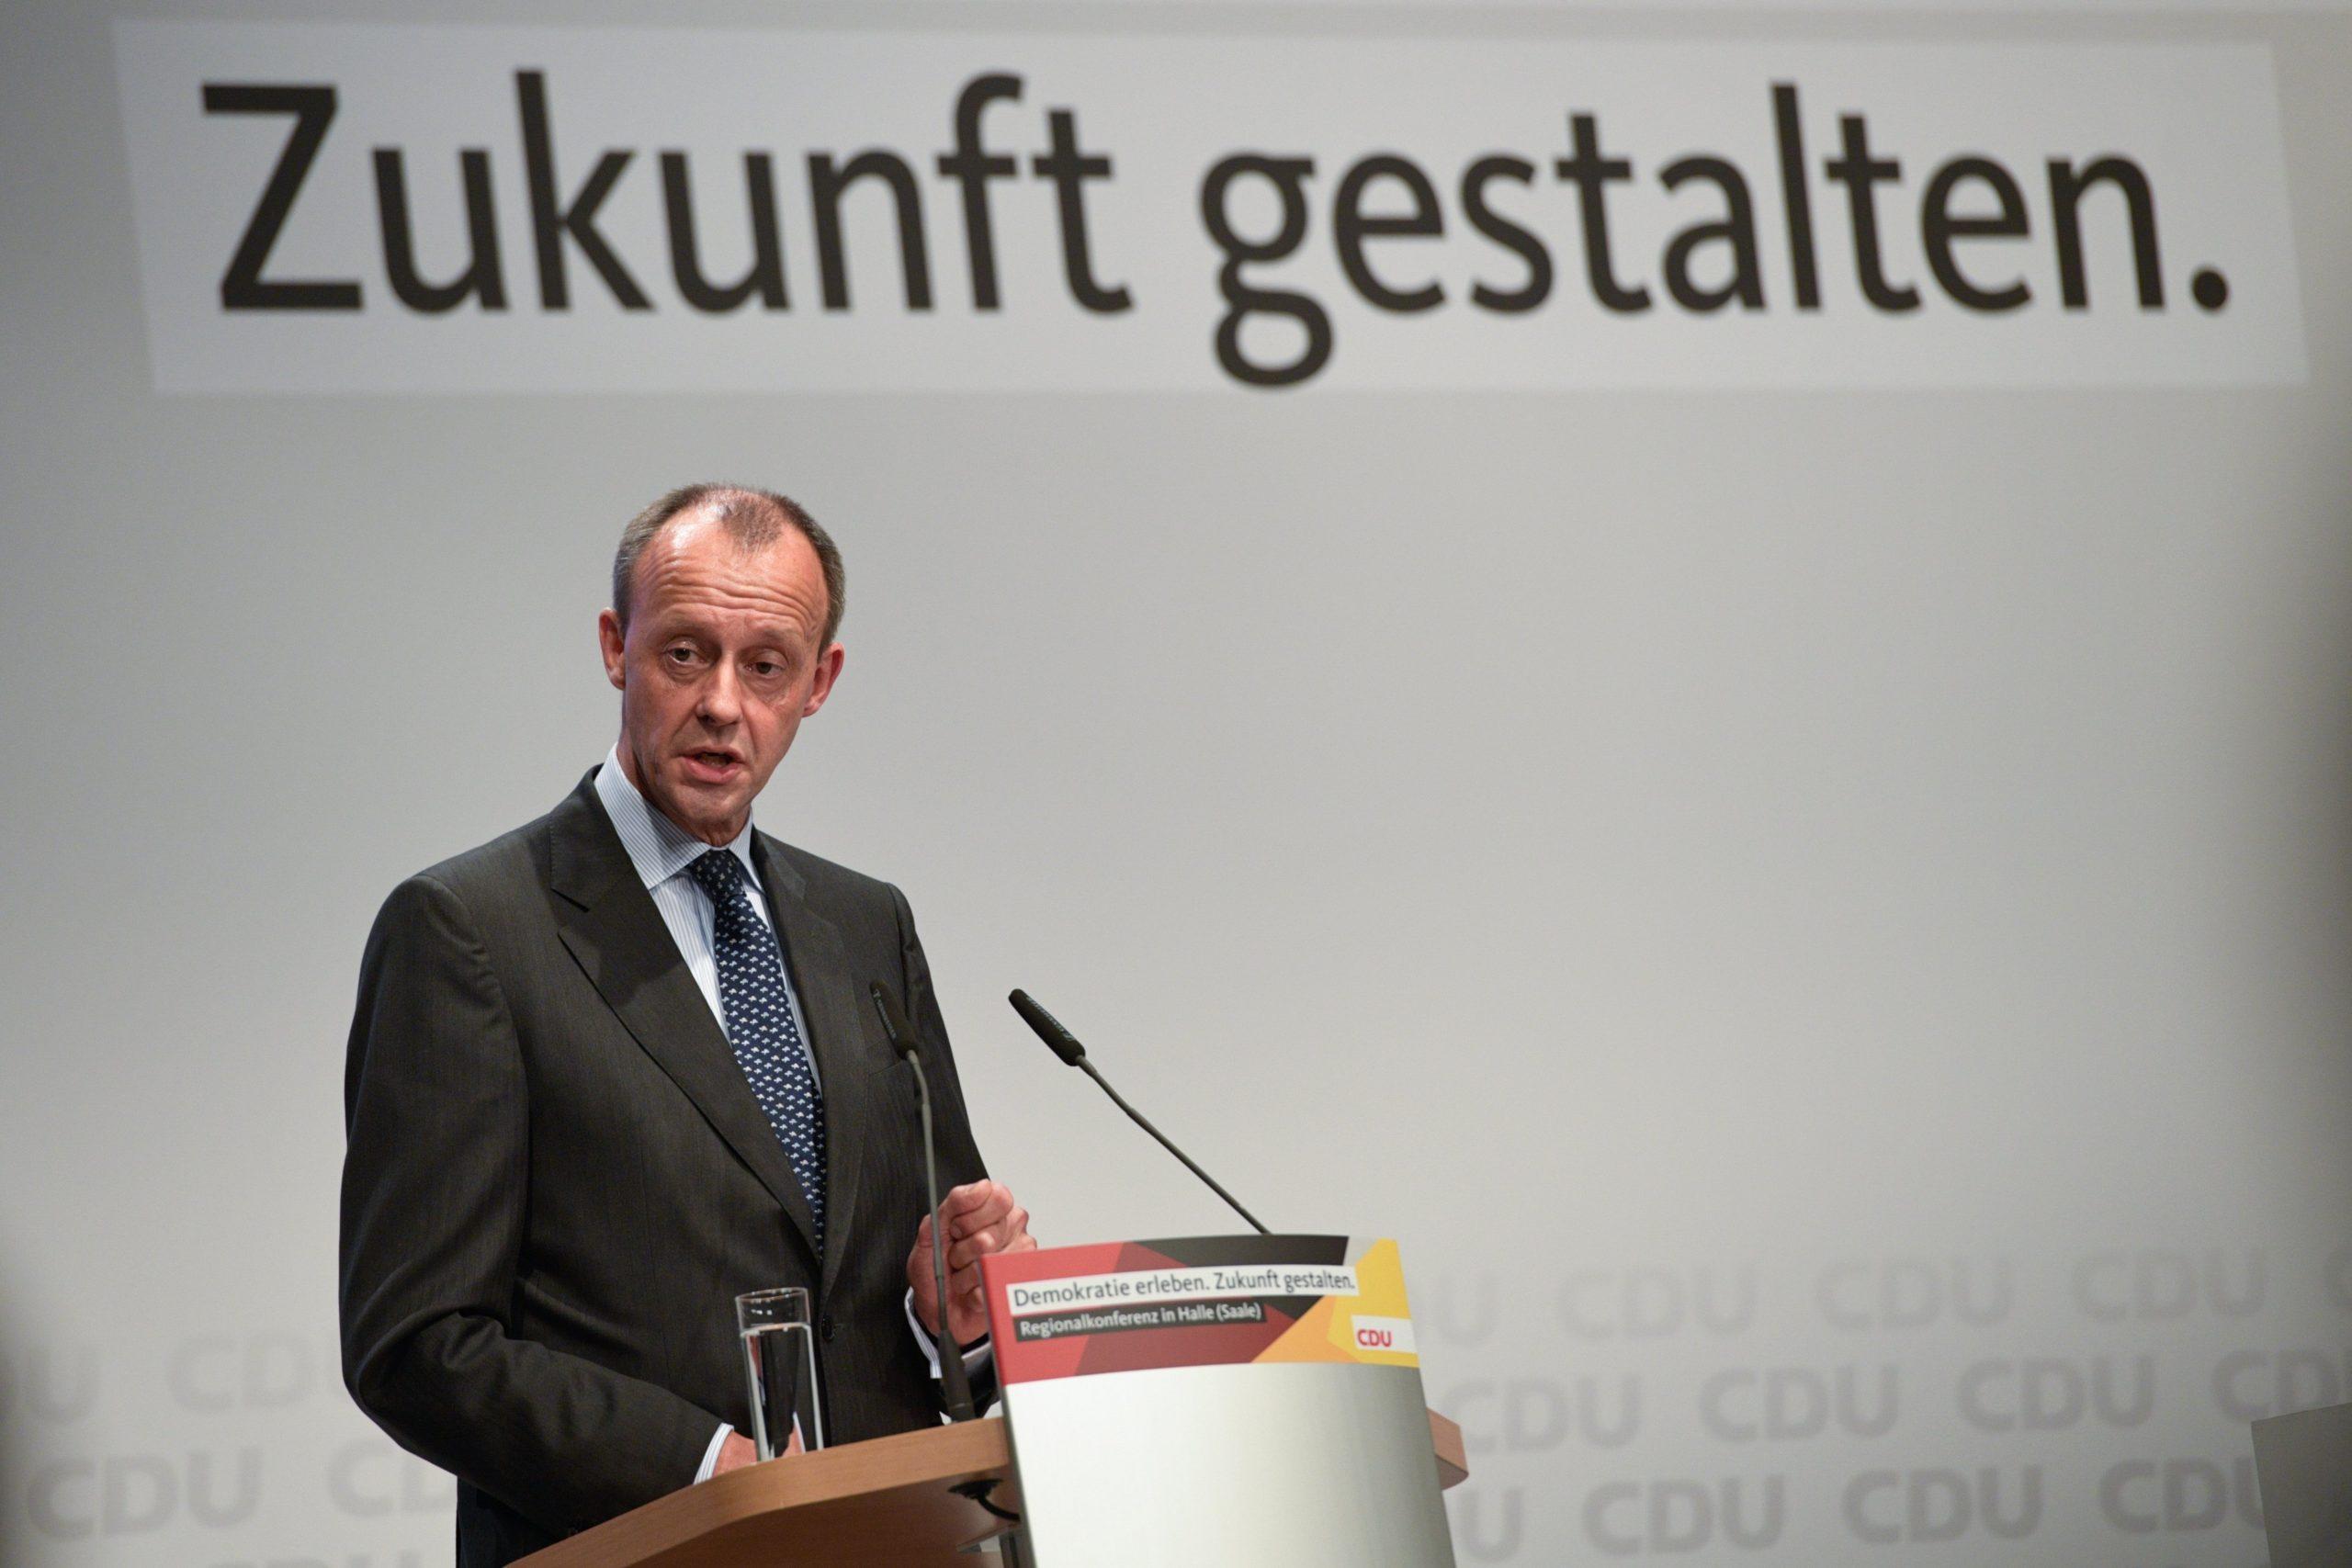 CDU-Chef-Kandidat Merz: